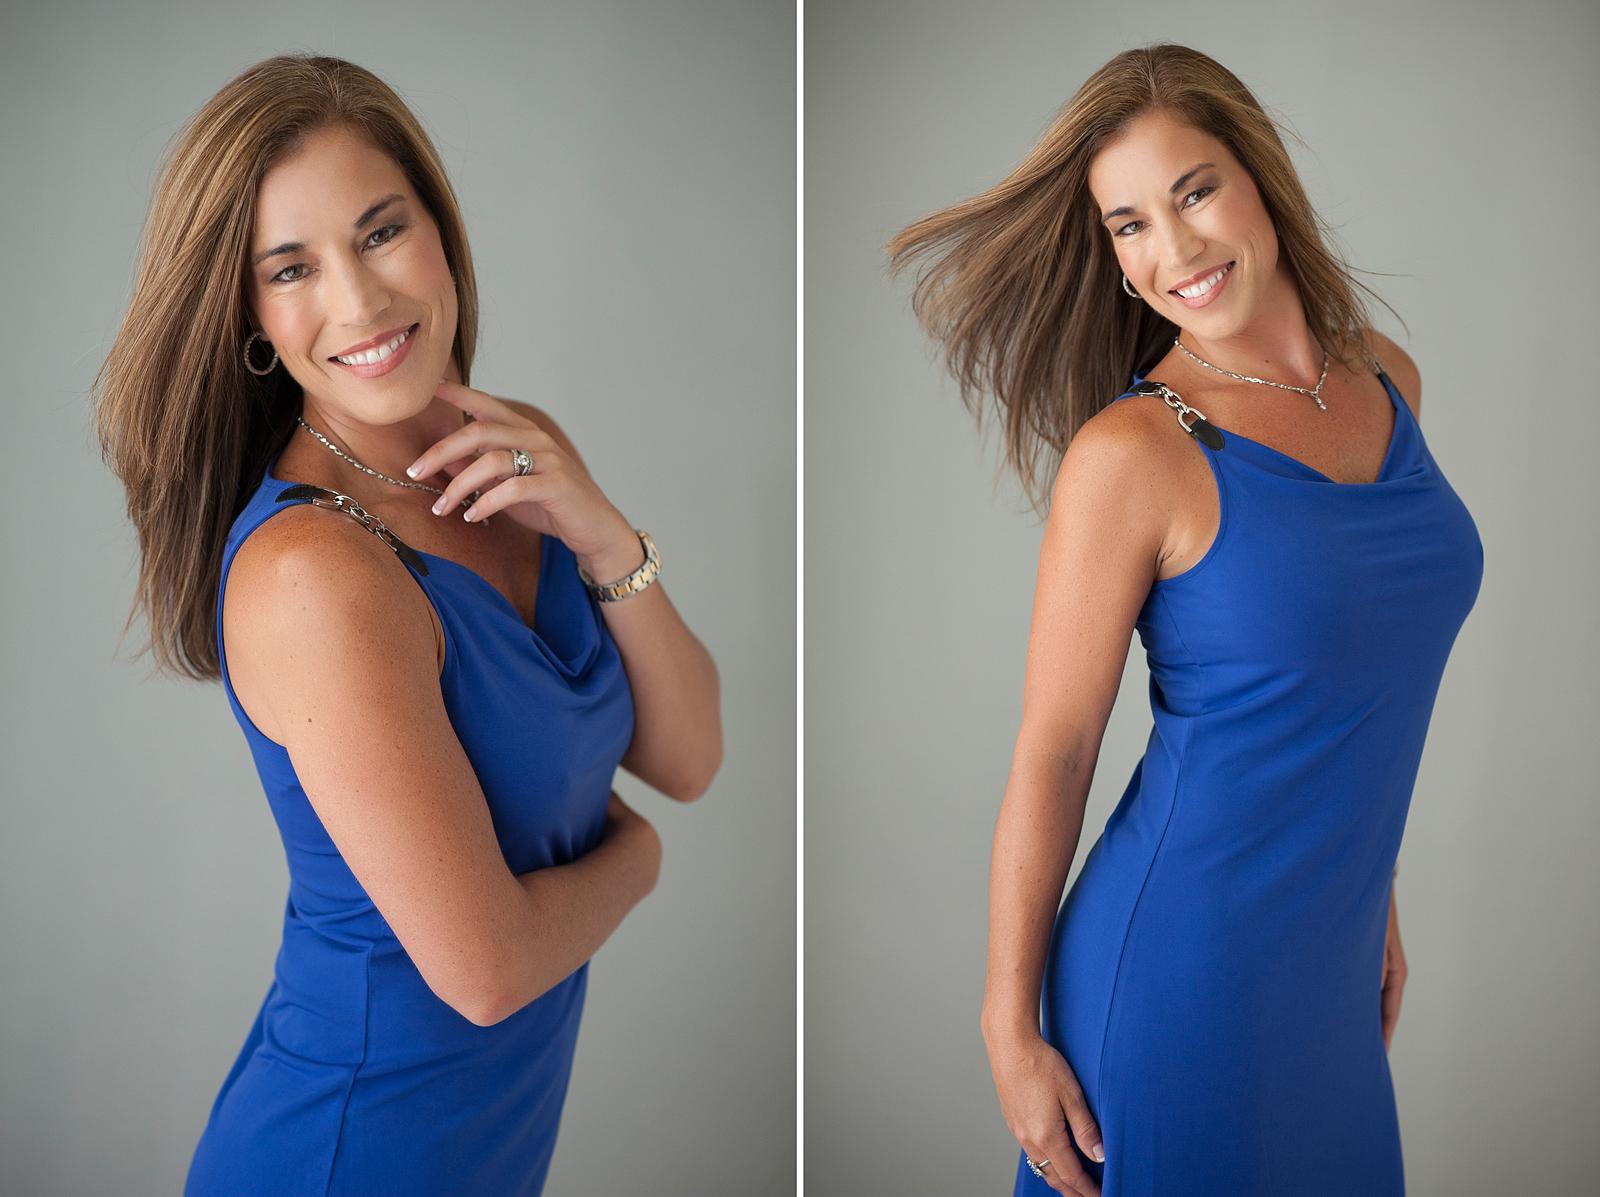 10-business-owner-stylist-woman-ceo-power-flirty.jpg